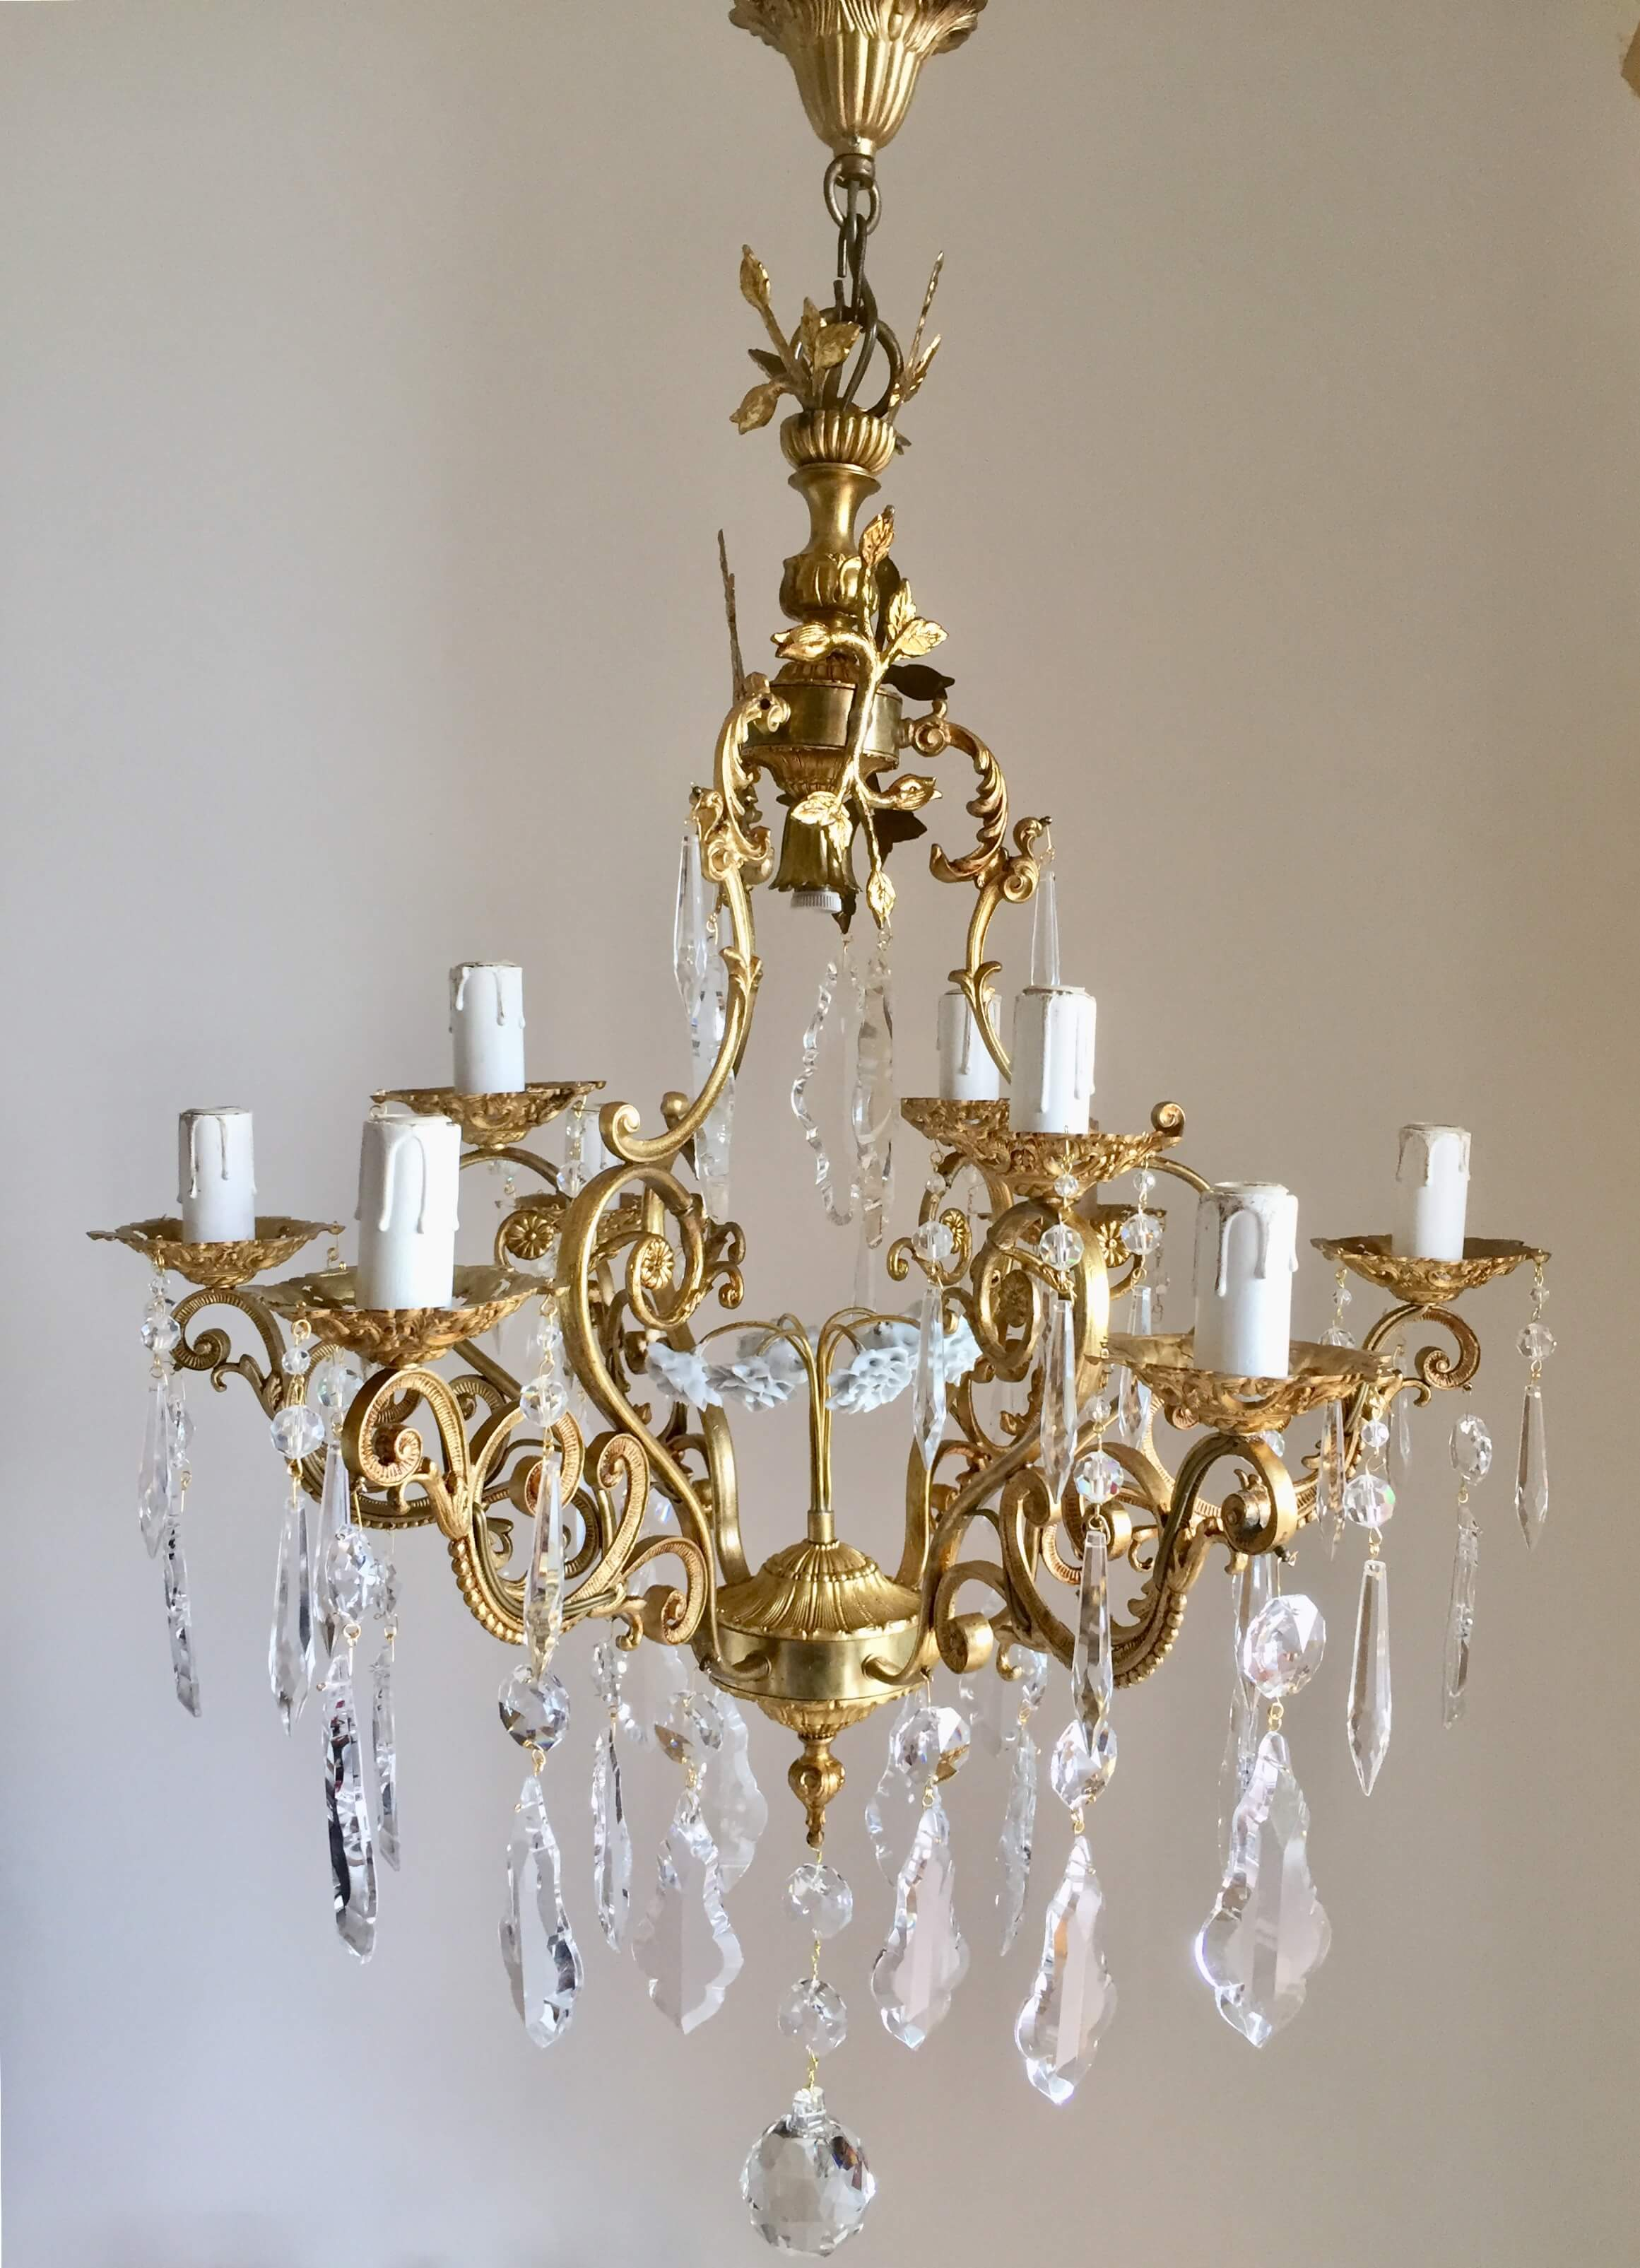 Le rêve fleuri de monaco golden brass vintage chandelier